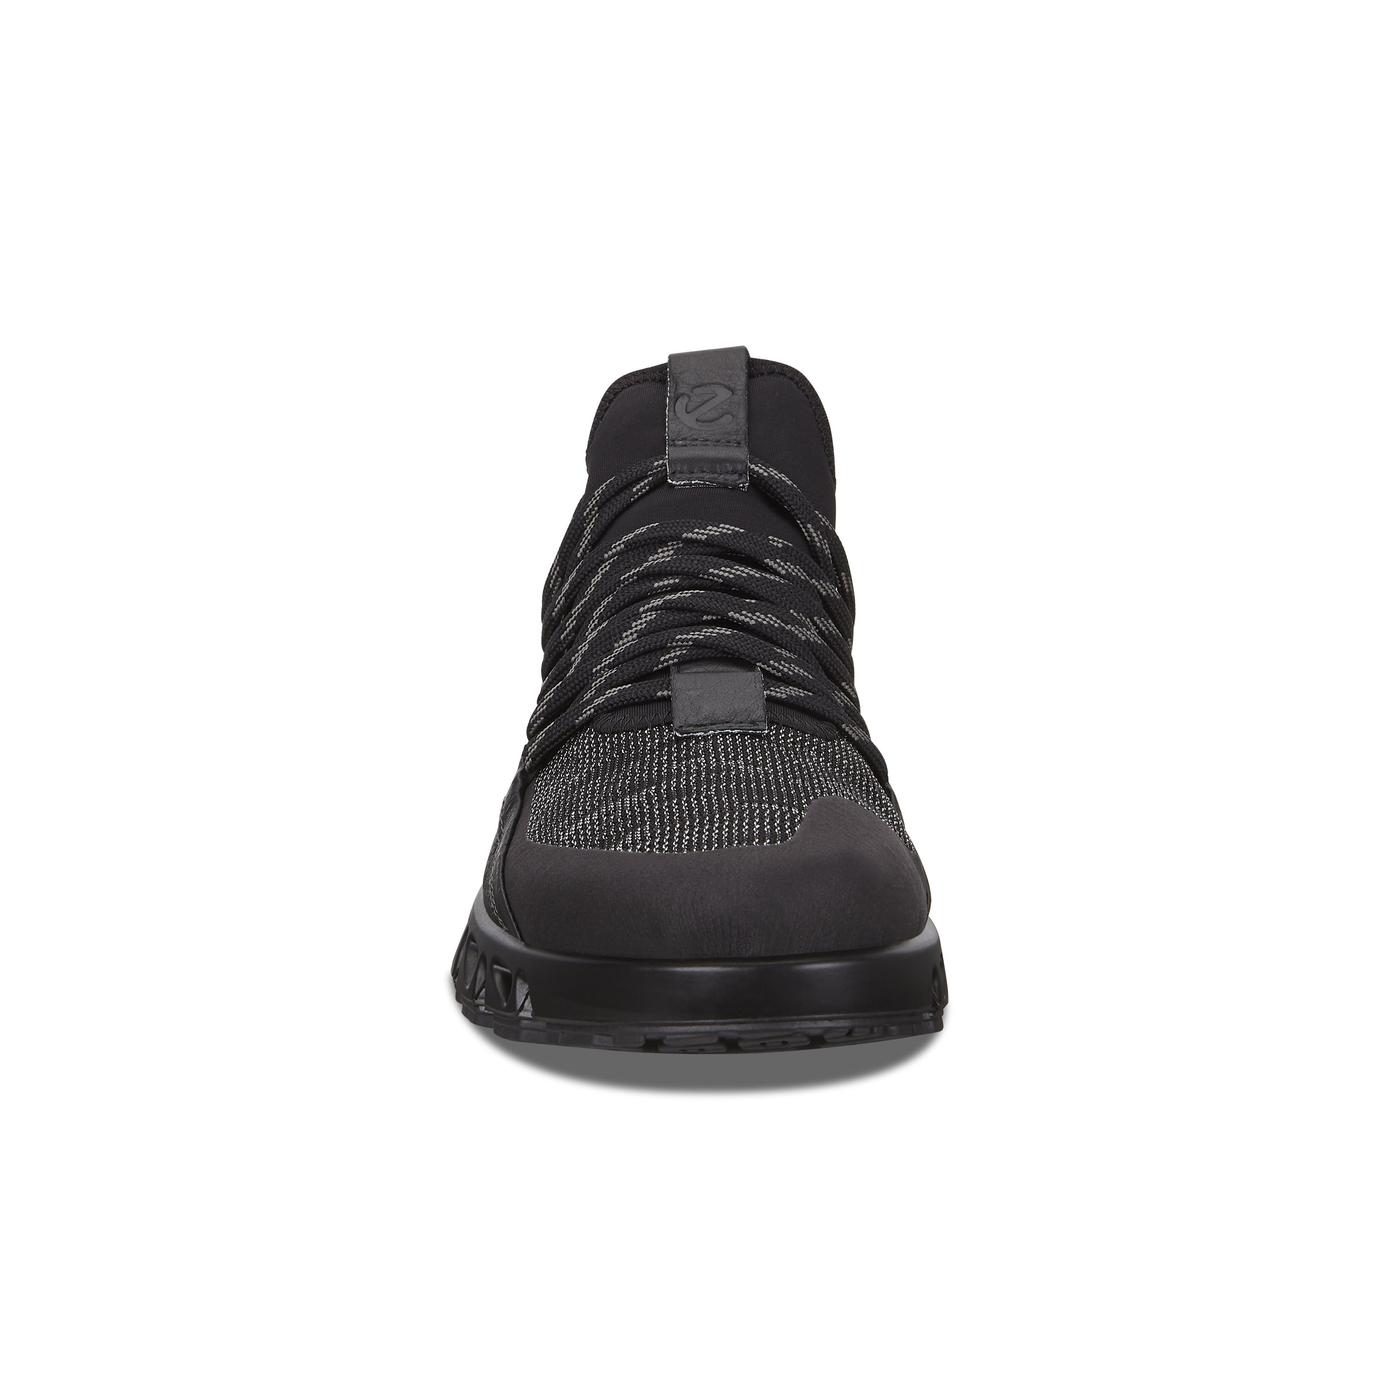 ECCO MULTI-VENT Outdoor Shoe